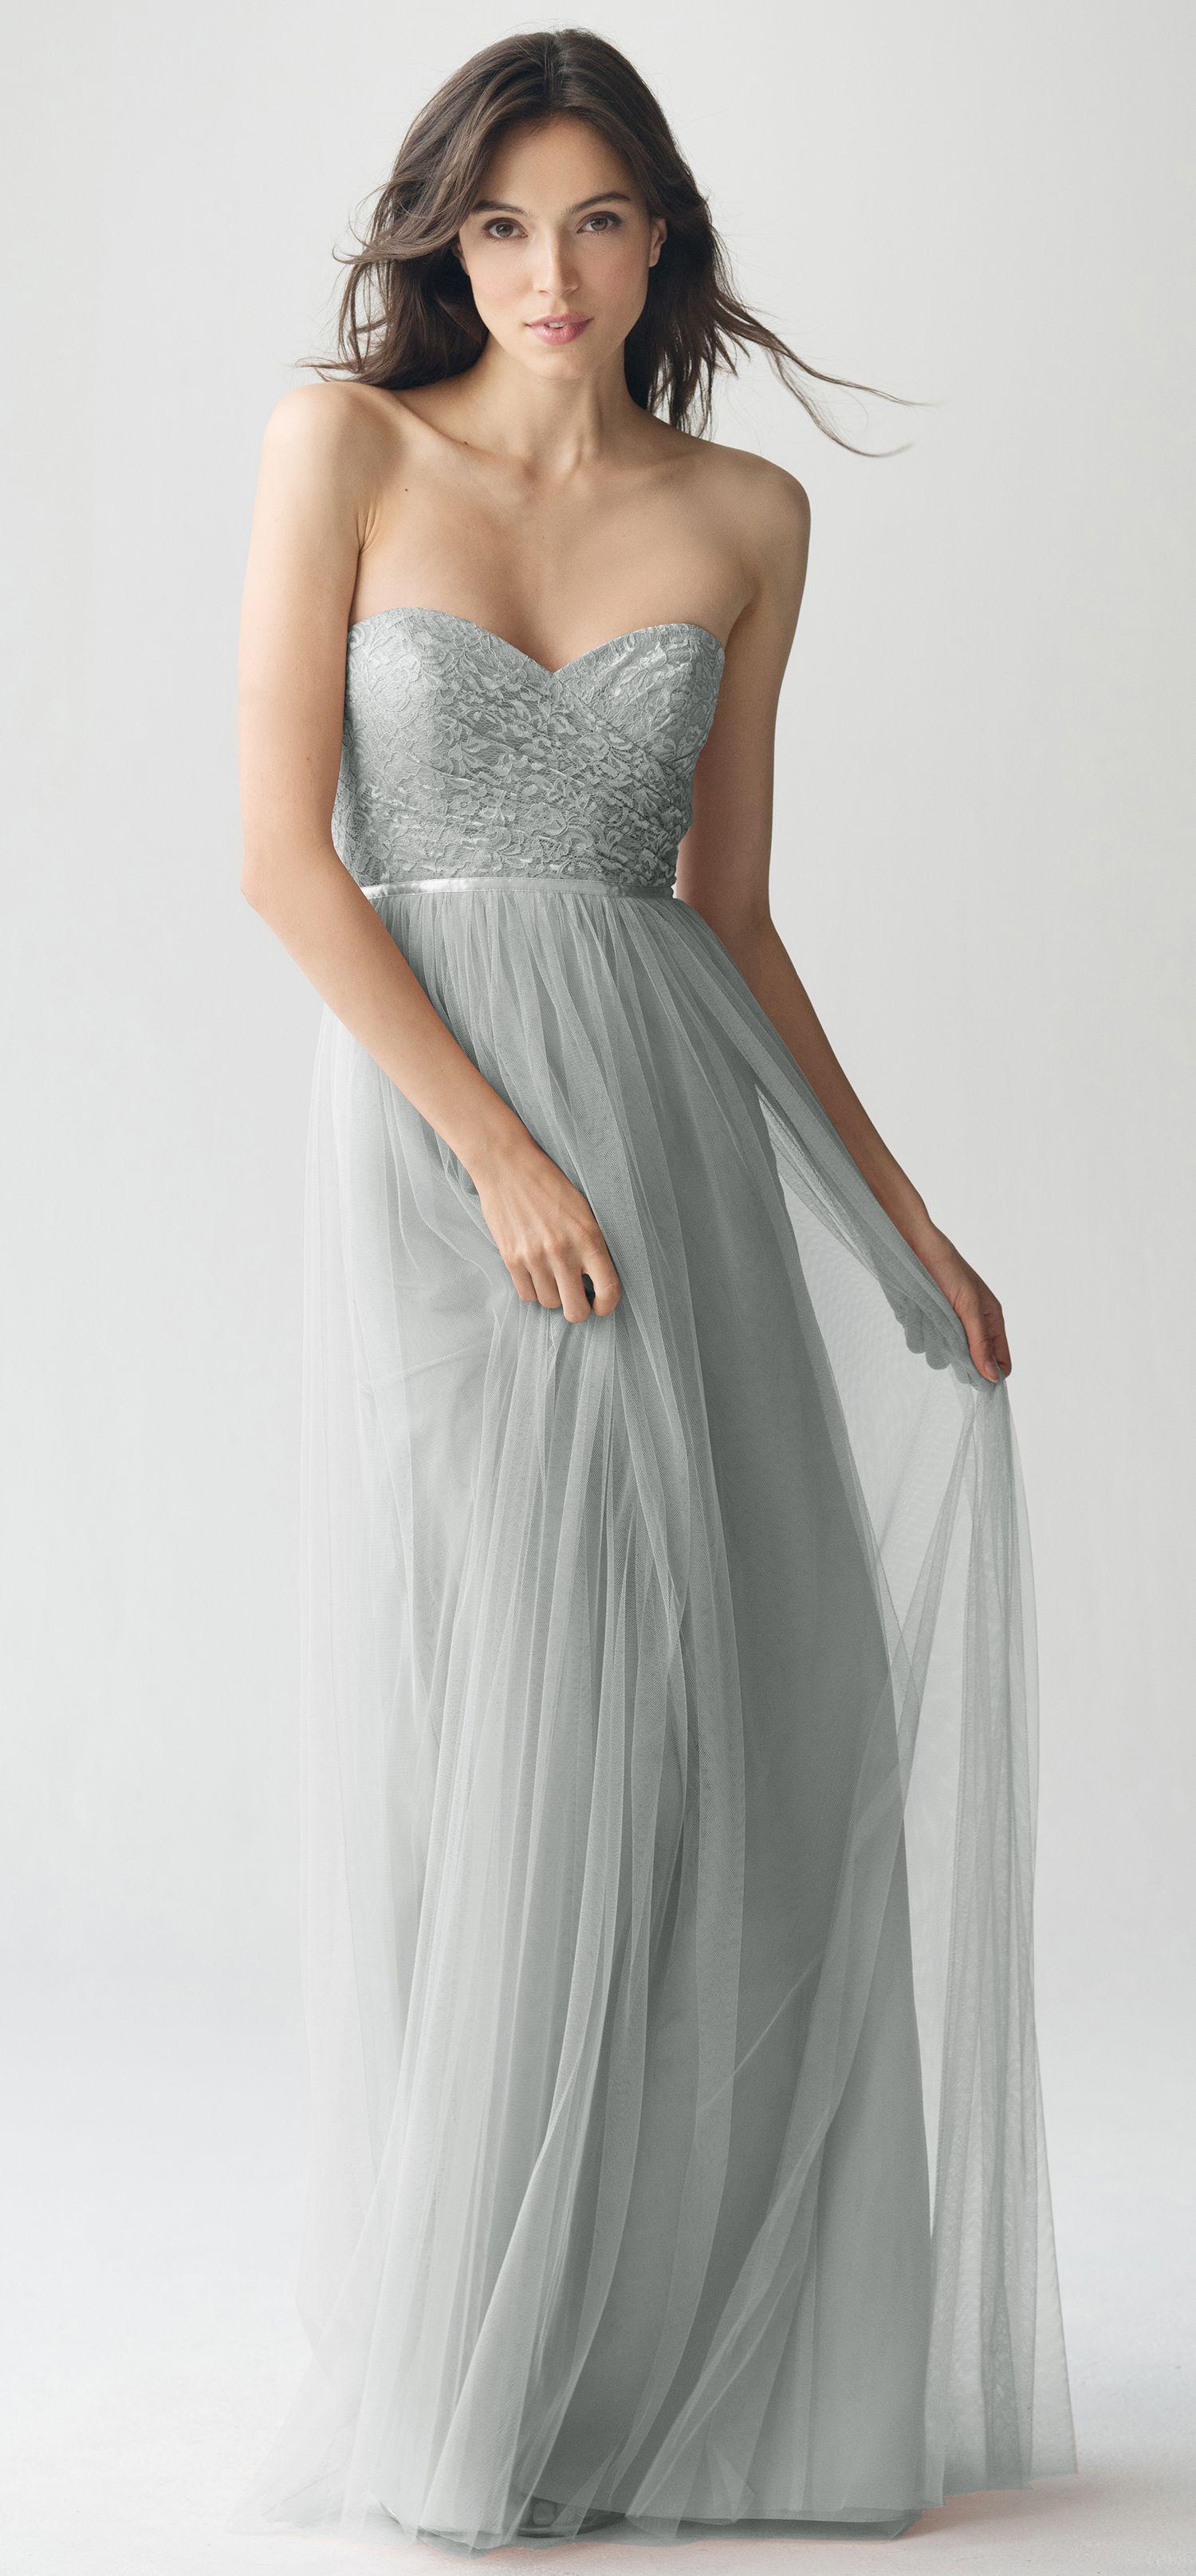 Talia bridesmaid dress in morning mist lace soft tulle by jenny talia bridesmaid dress in morning mist lace soft tulle by jenny yoo ombrellifo Images